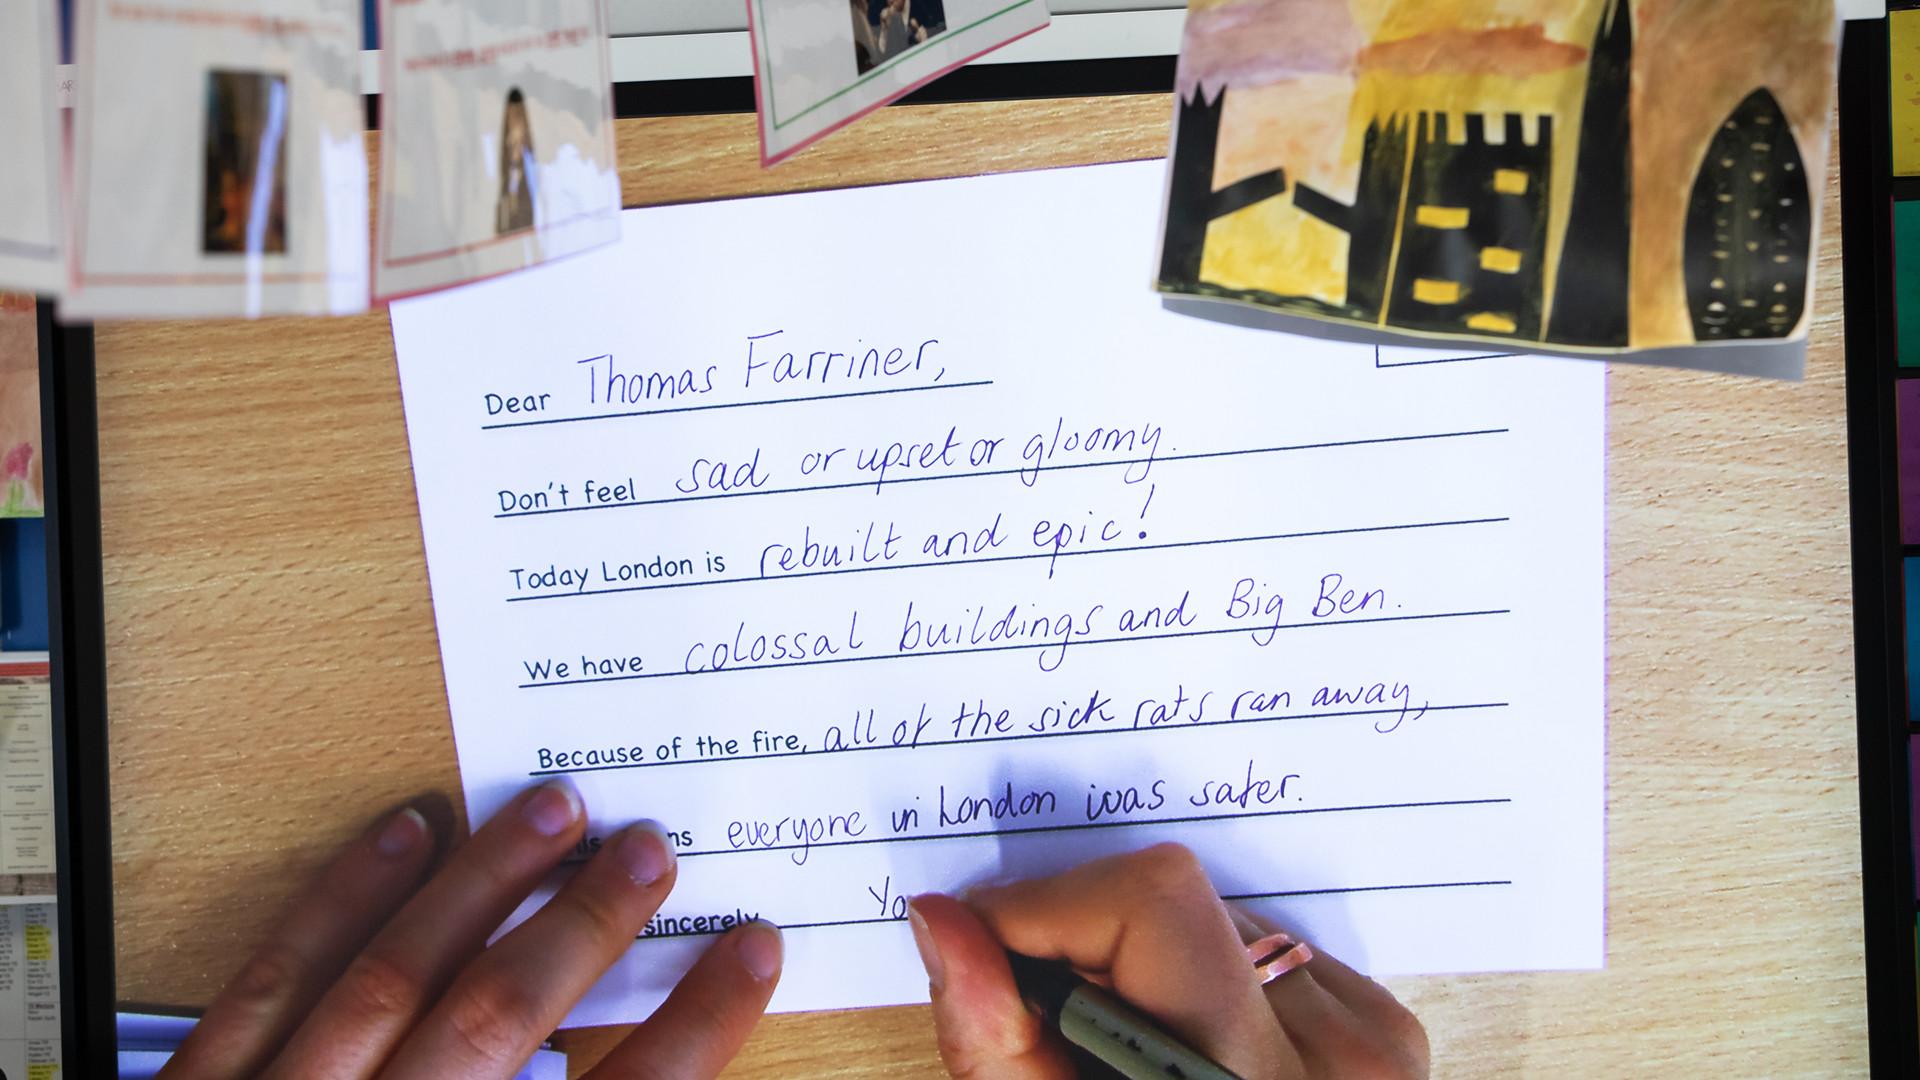 Children's letters to Thomas Farriner